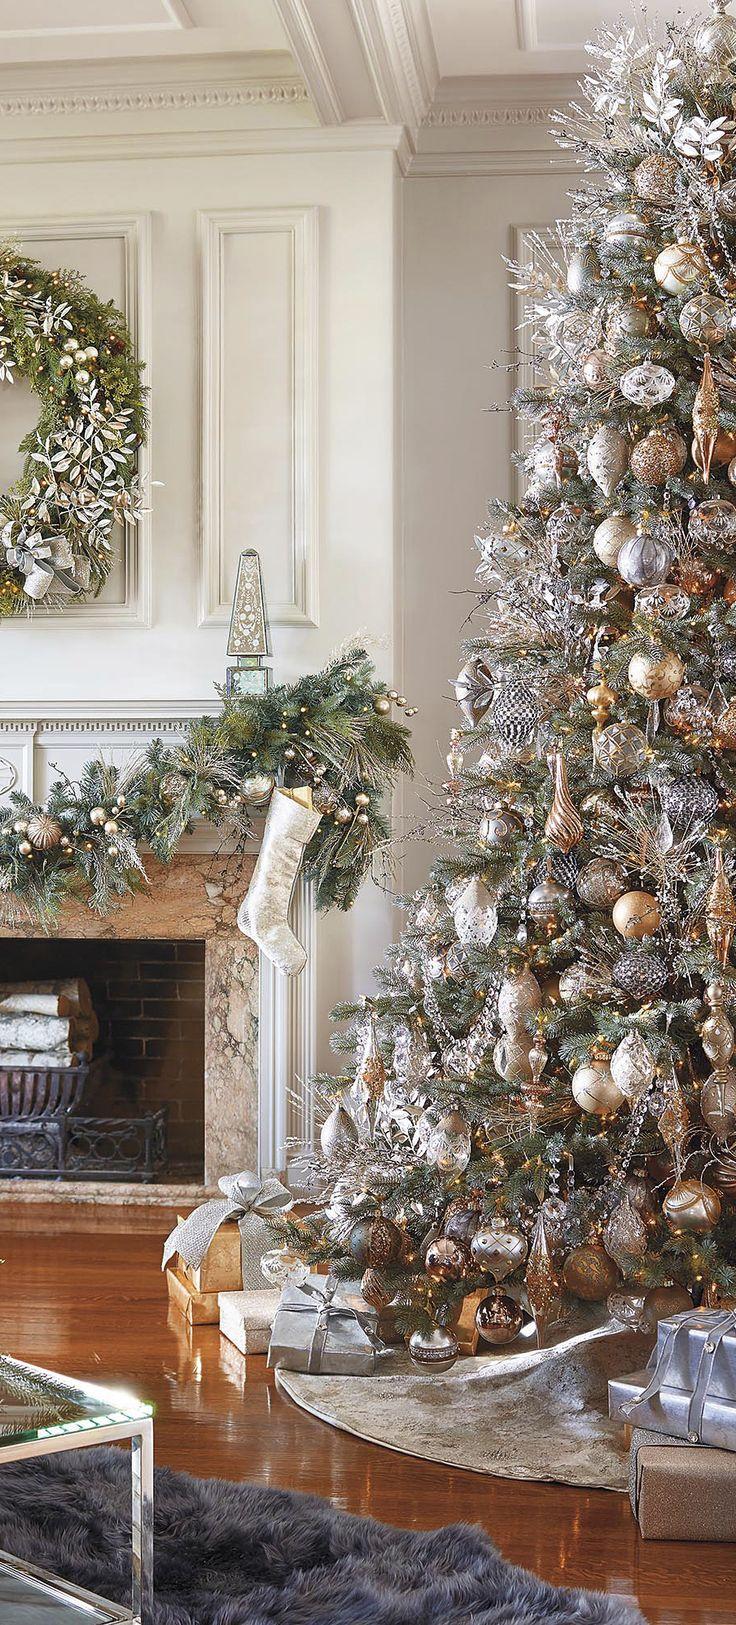 Mrs potts chip christmas decoration - Beautiful Metallic Christmas Tree Www Earthgear Com